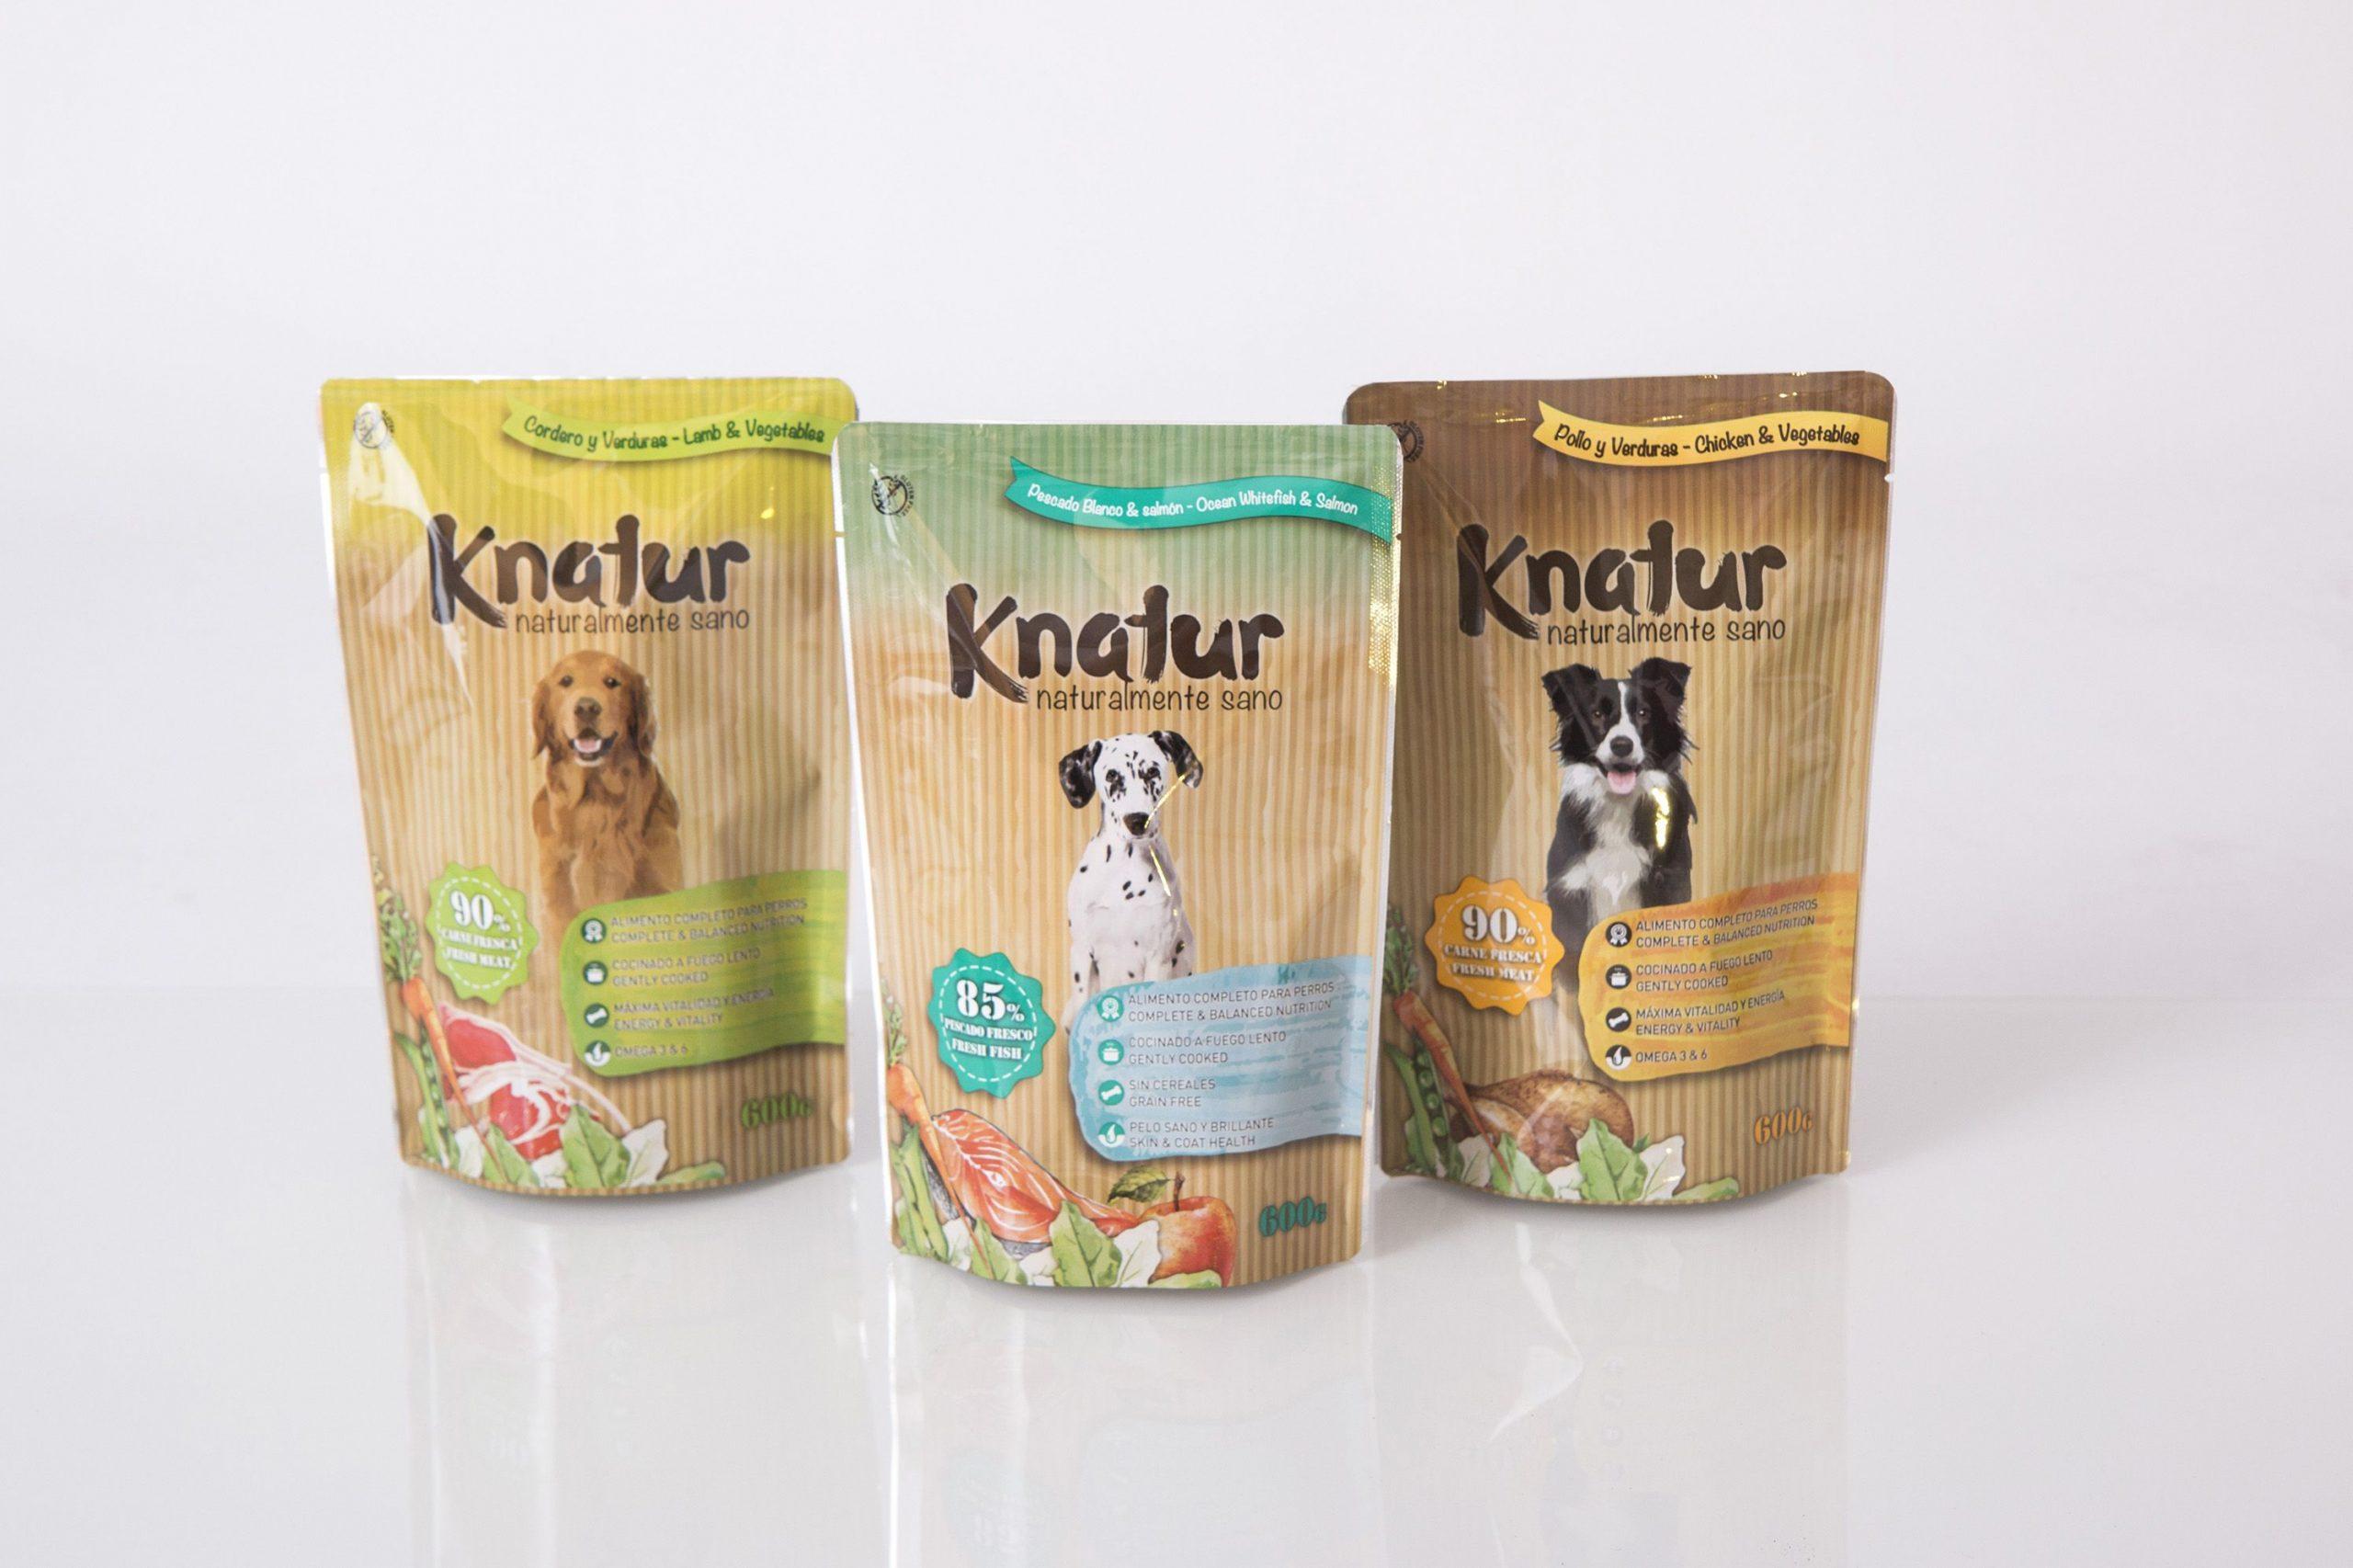 Comida natural para perros Knatur